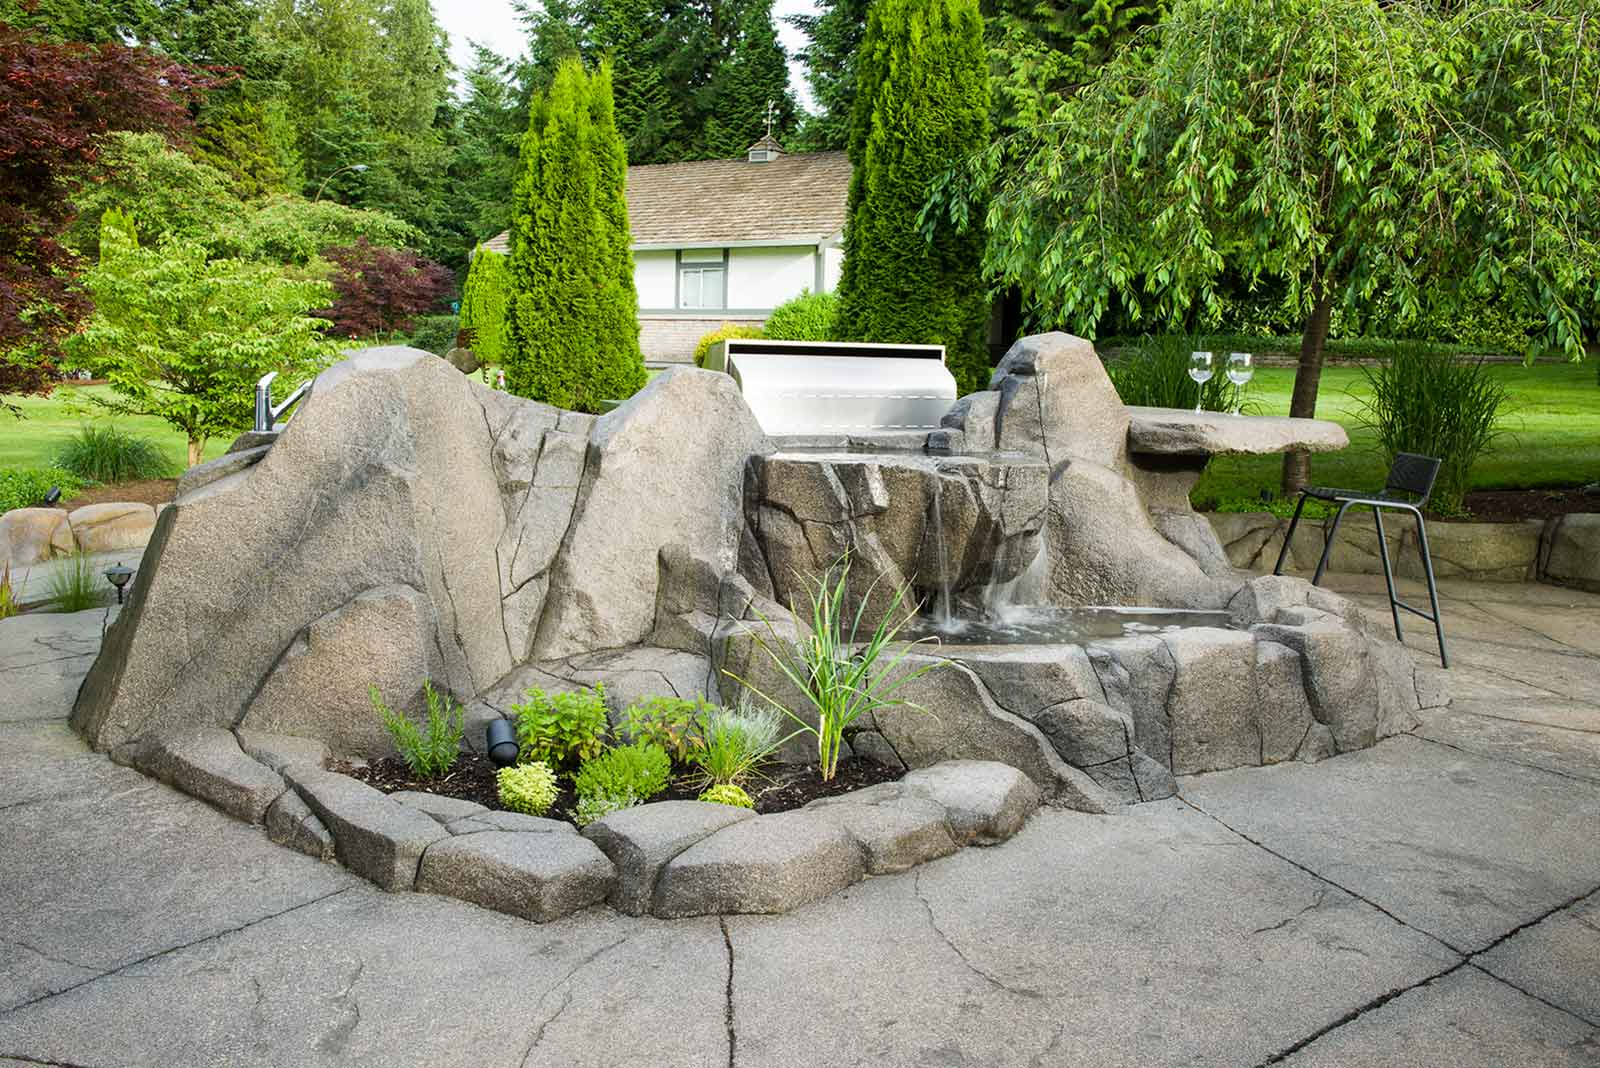 Artificial concrete rock work